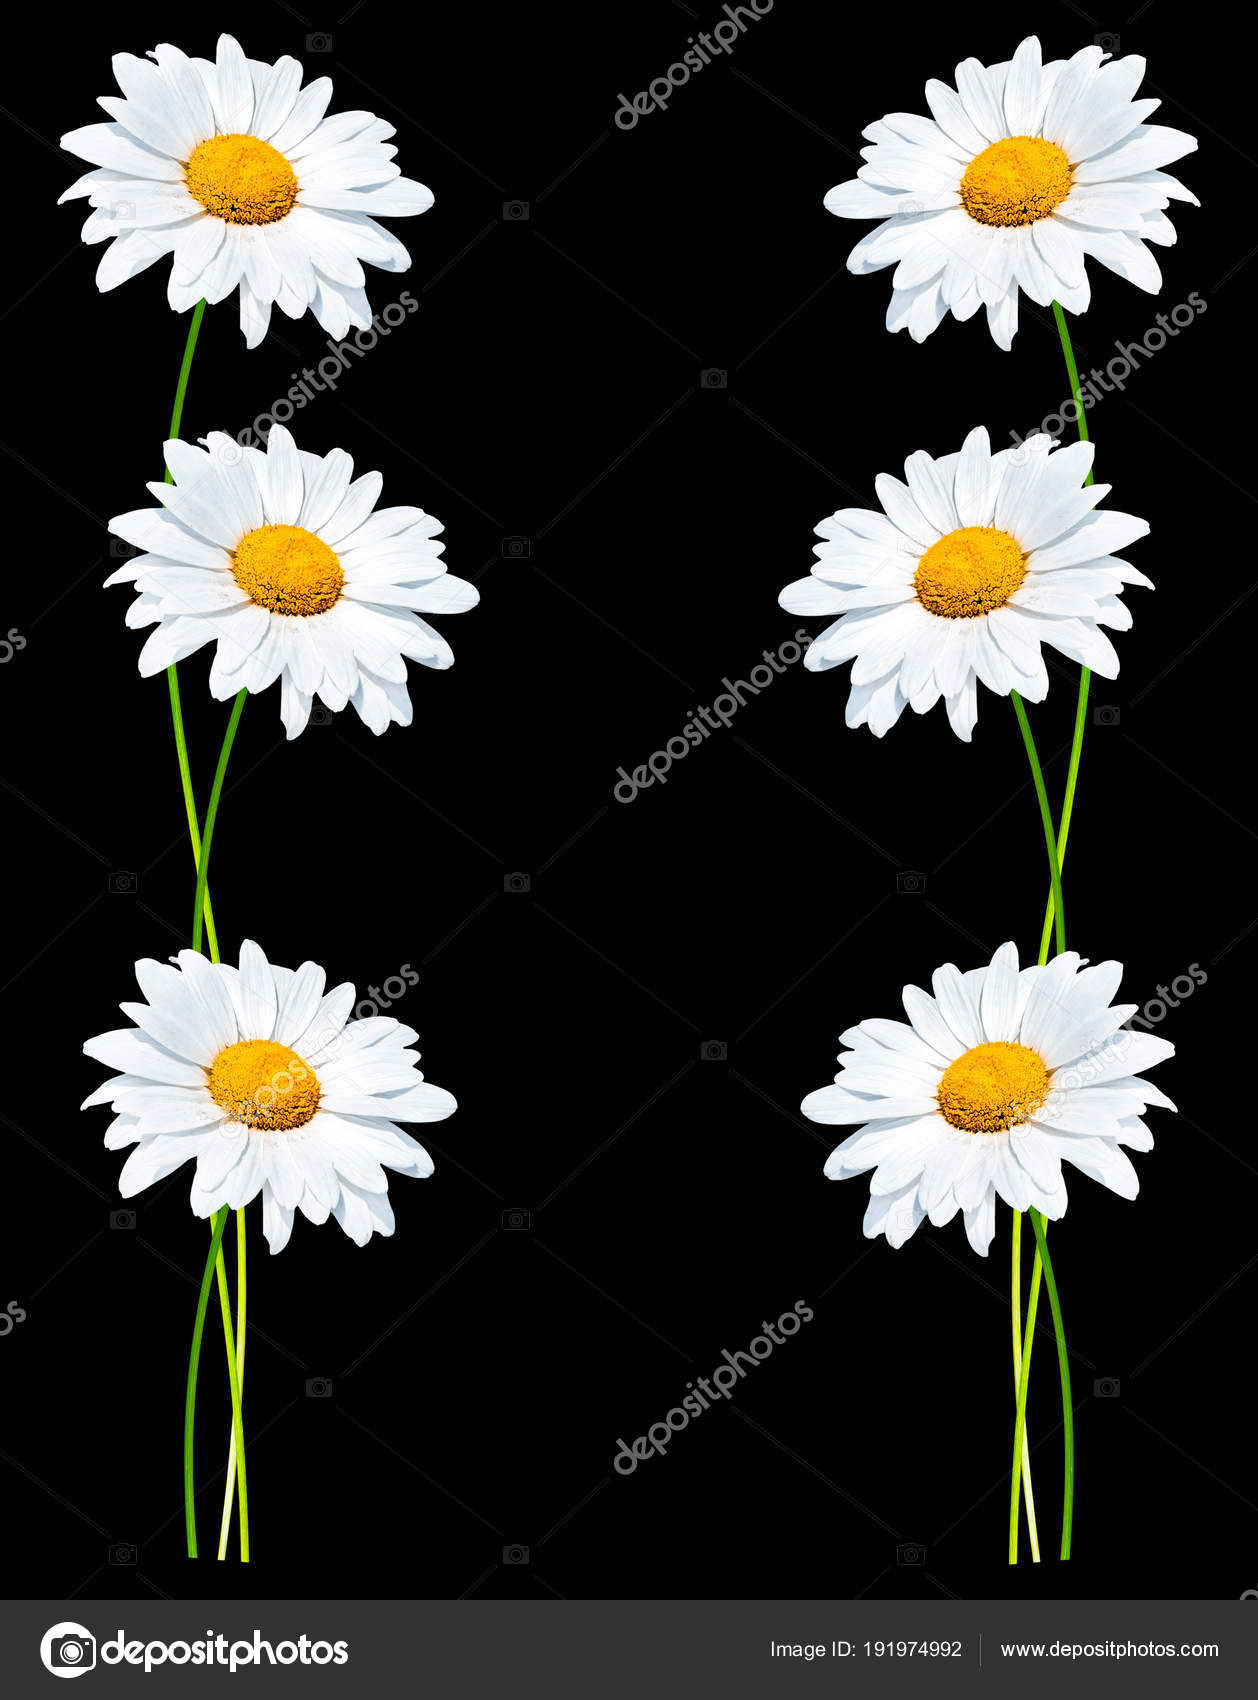 Daisies summer white flower stock photo alenalihacheva 191974992 daisies summer white flower isolated on black background photo by alenalihacheva izmirmasajfo